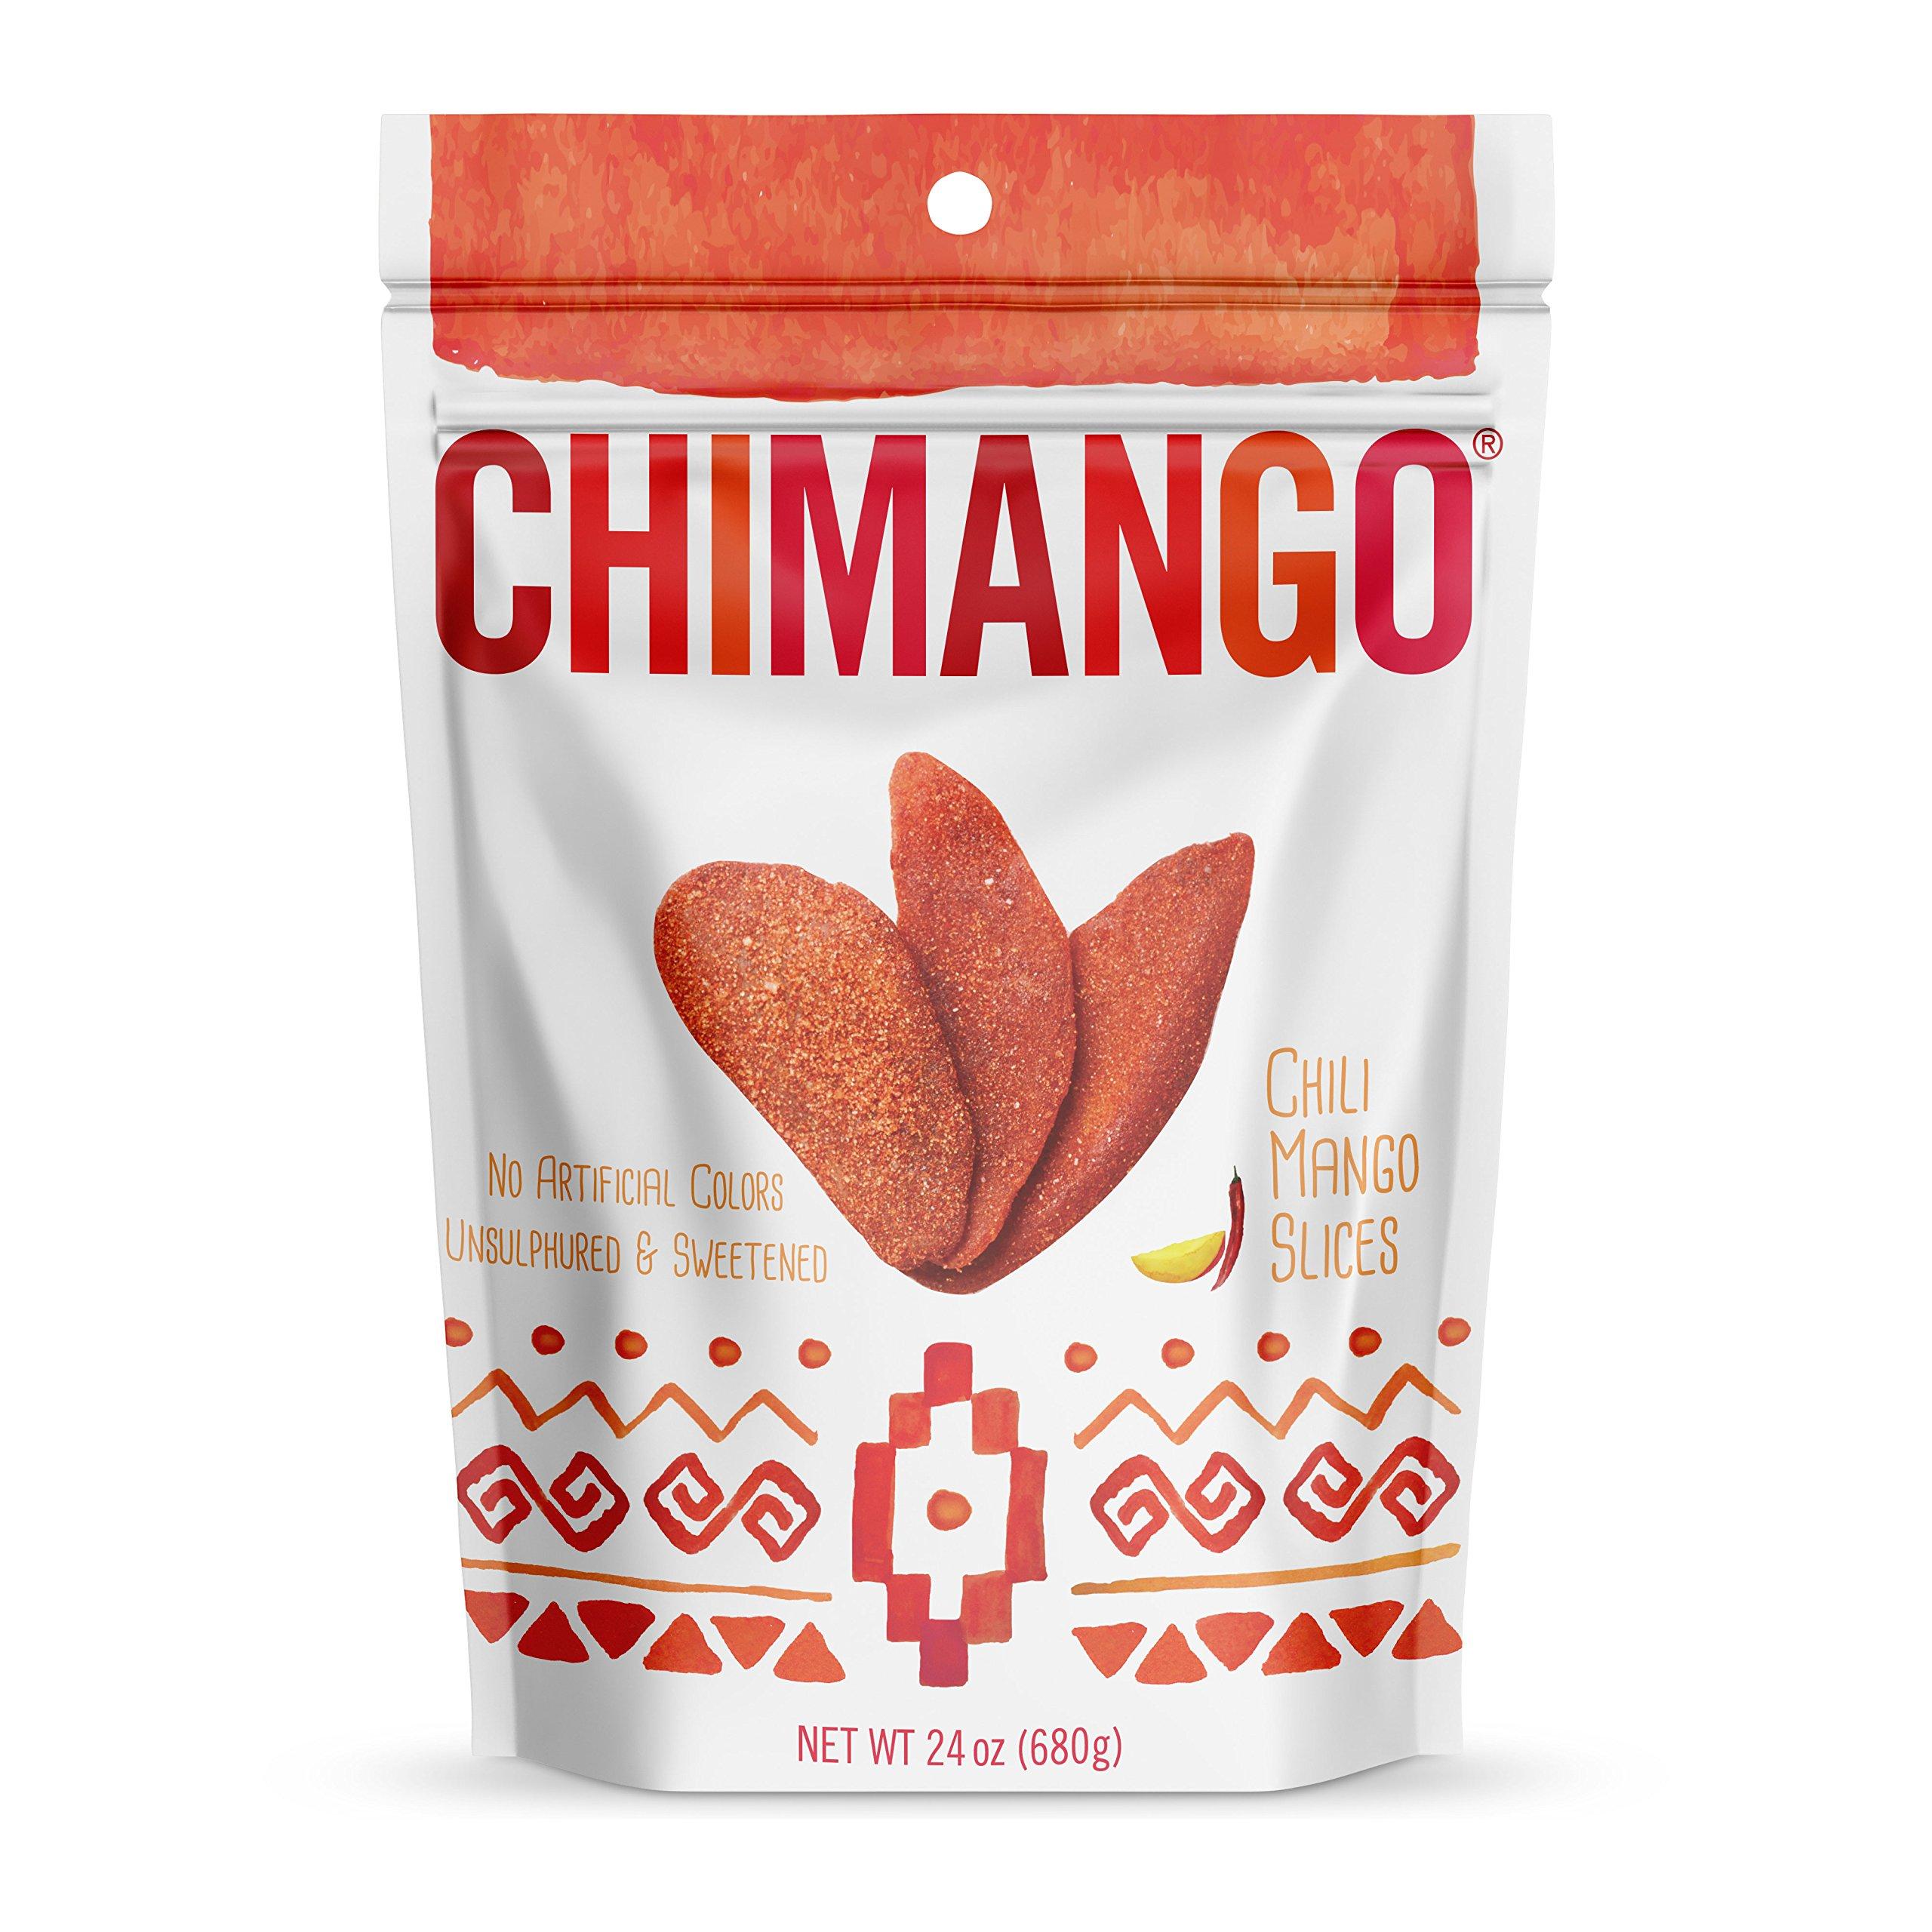 CHIMANGO Chili Mango Slices (24 oz) by CHIMANGO